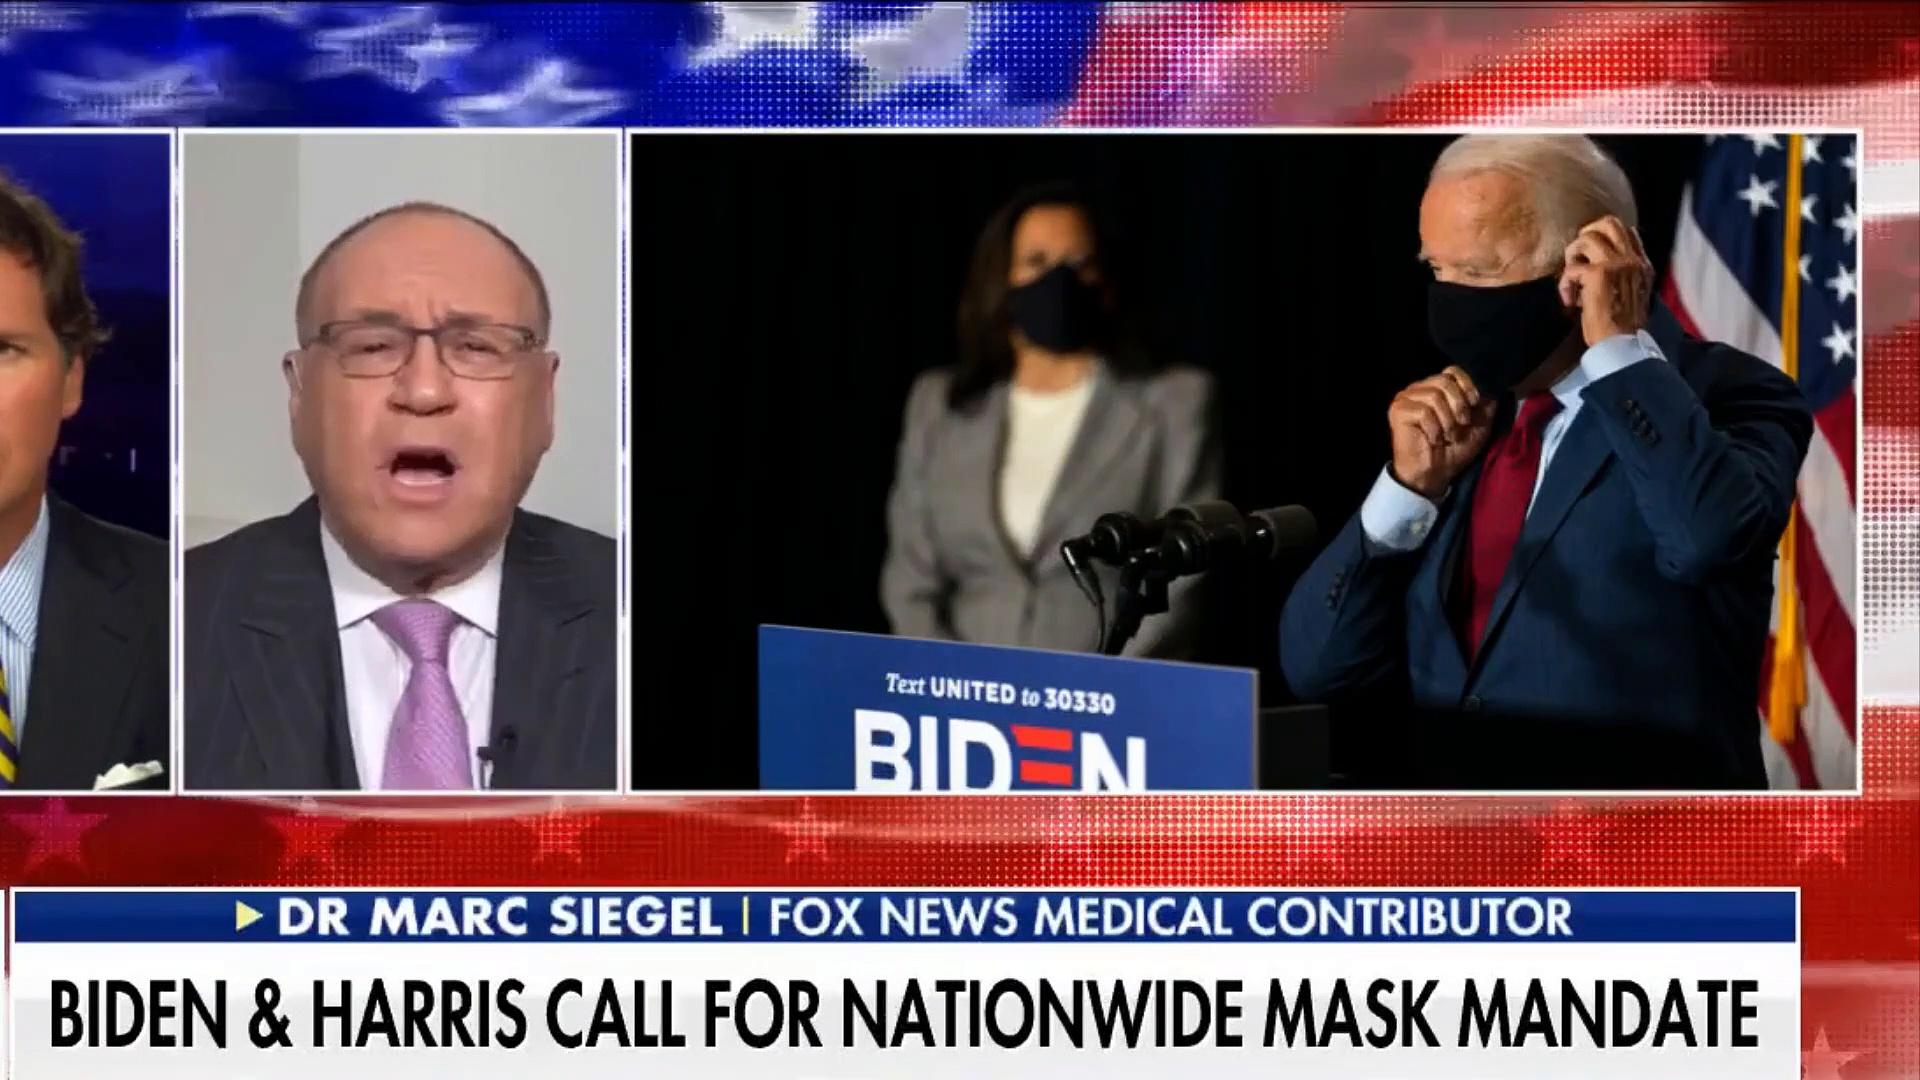 #NEWS| Biden and Harris propose nationwide mask mandate to fight coronavirus – Fox News Video